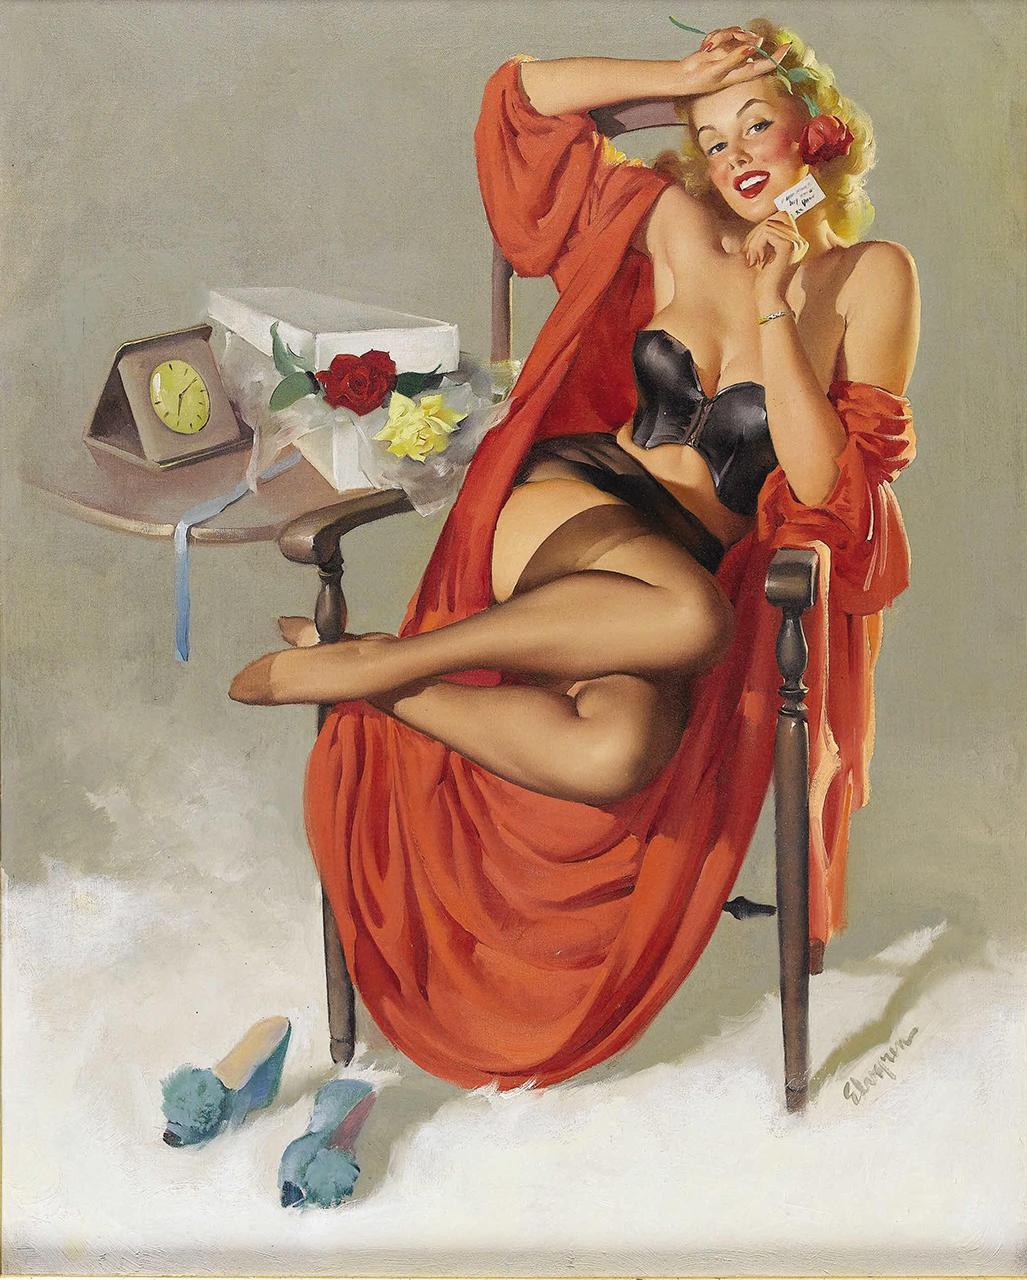 Постер (плакат) Джил Элвгрен: American beauties